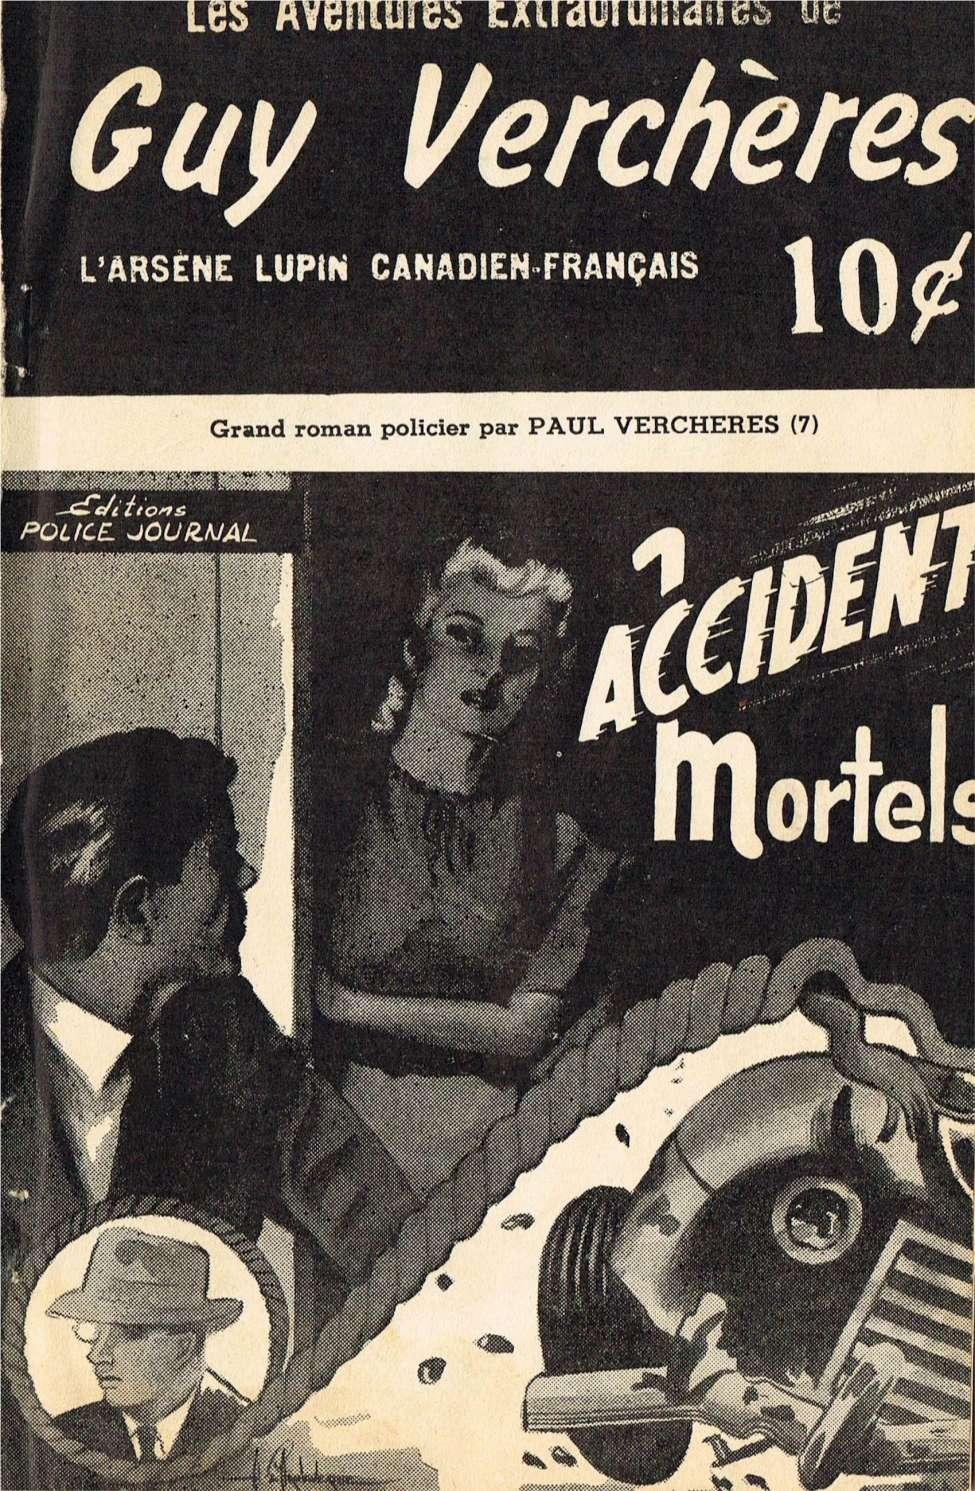 Comic Book Cover For Guy-Vercheres v2 07 - Accidents mortels